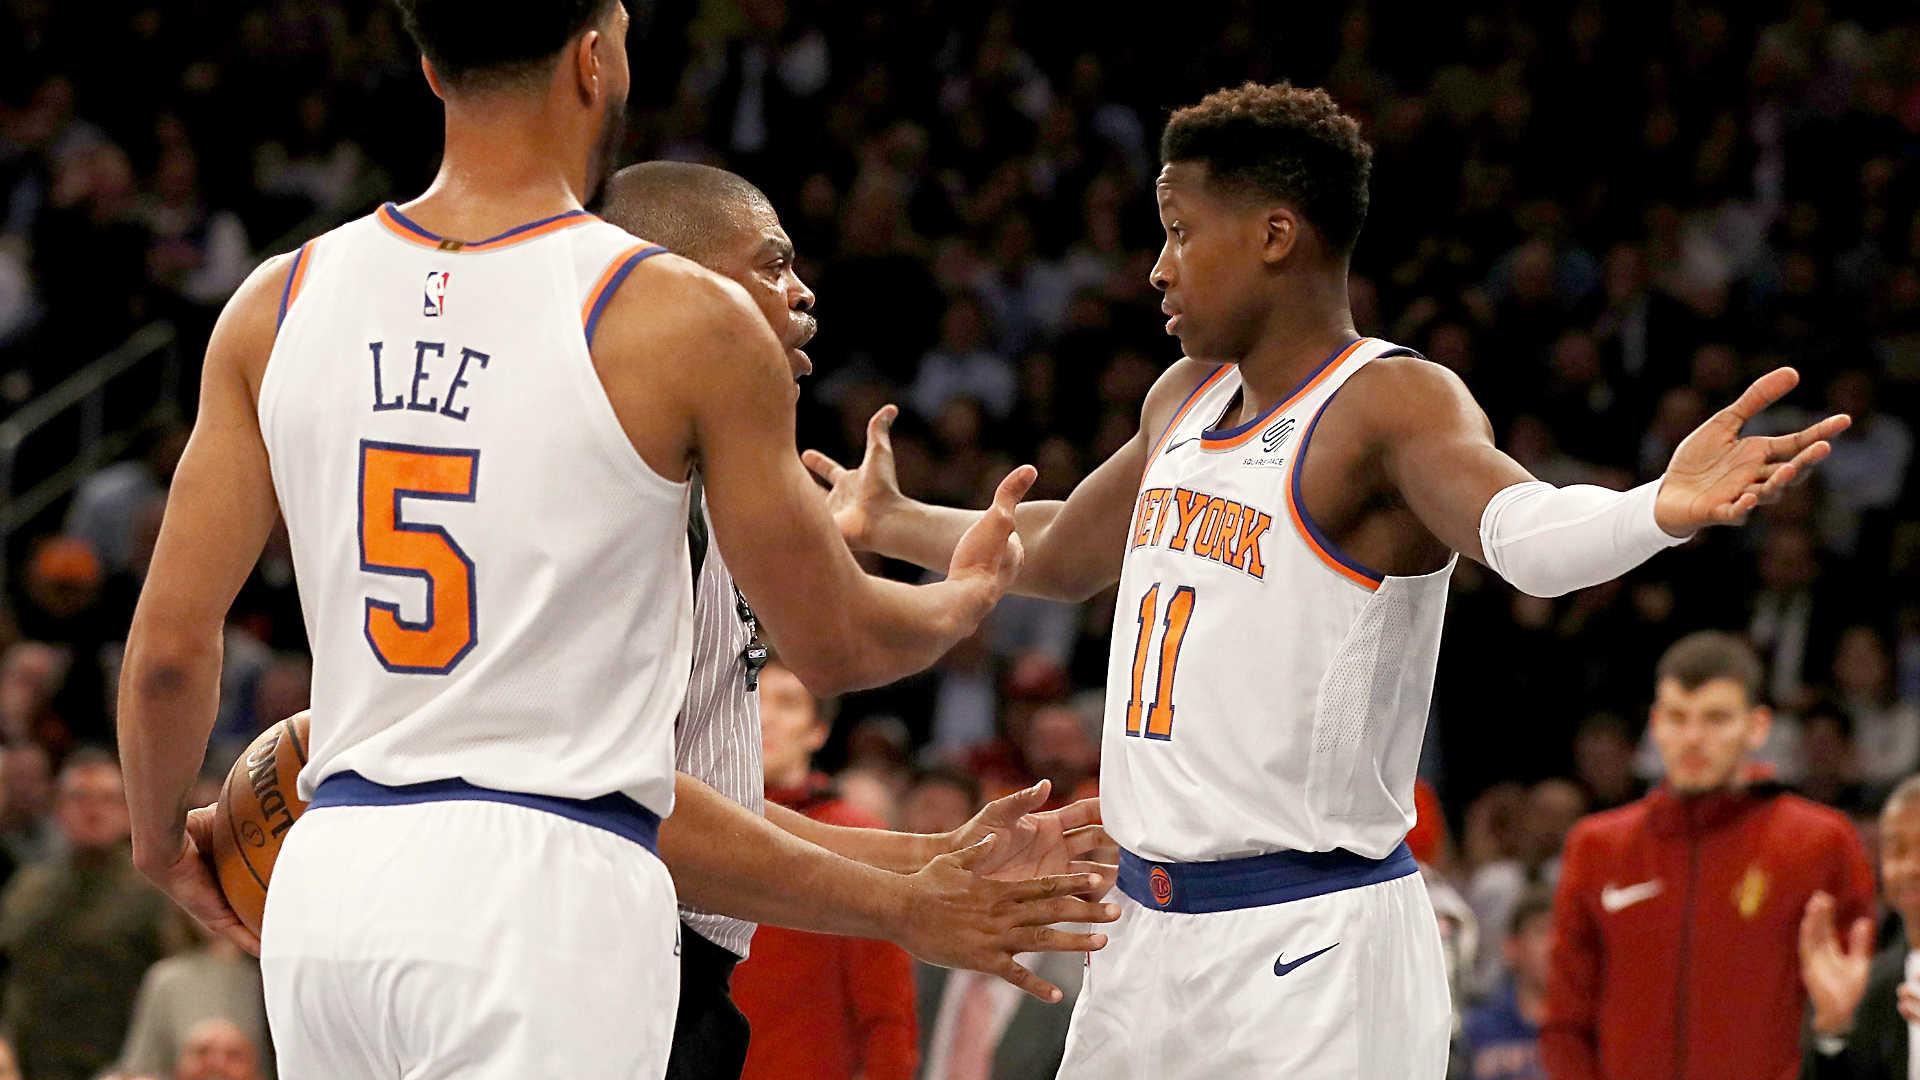 9a548ff5cbe Knicks rookie Frank Ntilikina shoves LeBron James  response to LBJ s  comments